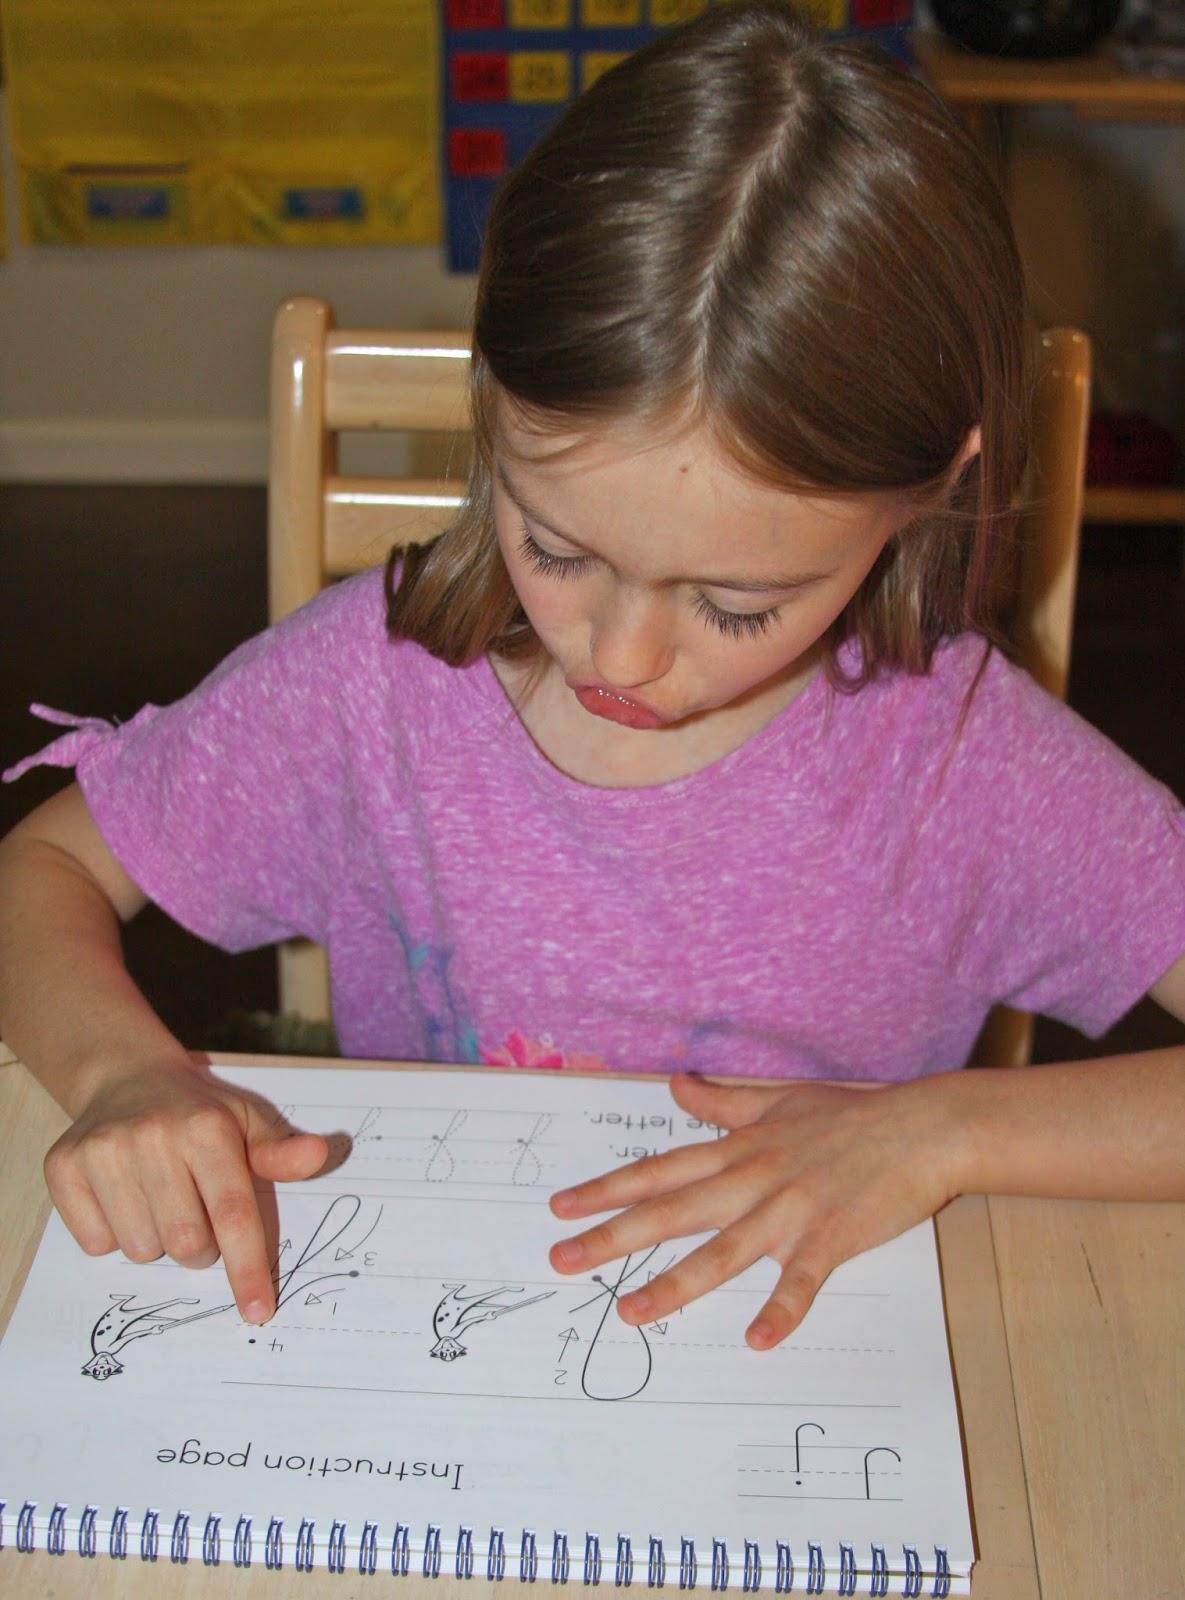 Cursive handwriting homework